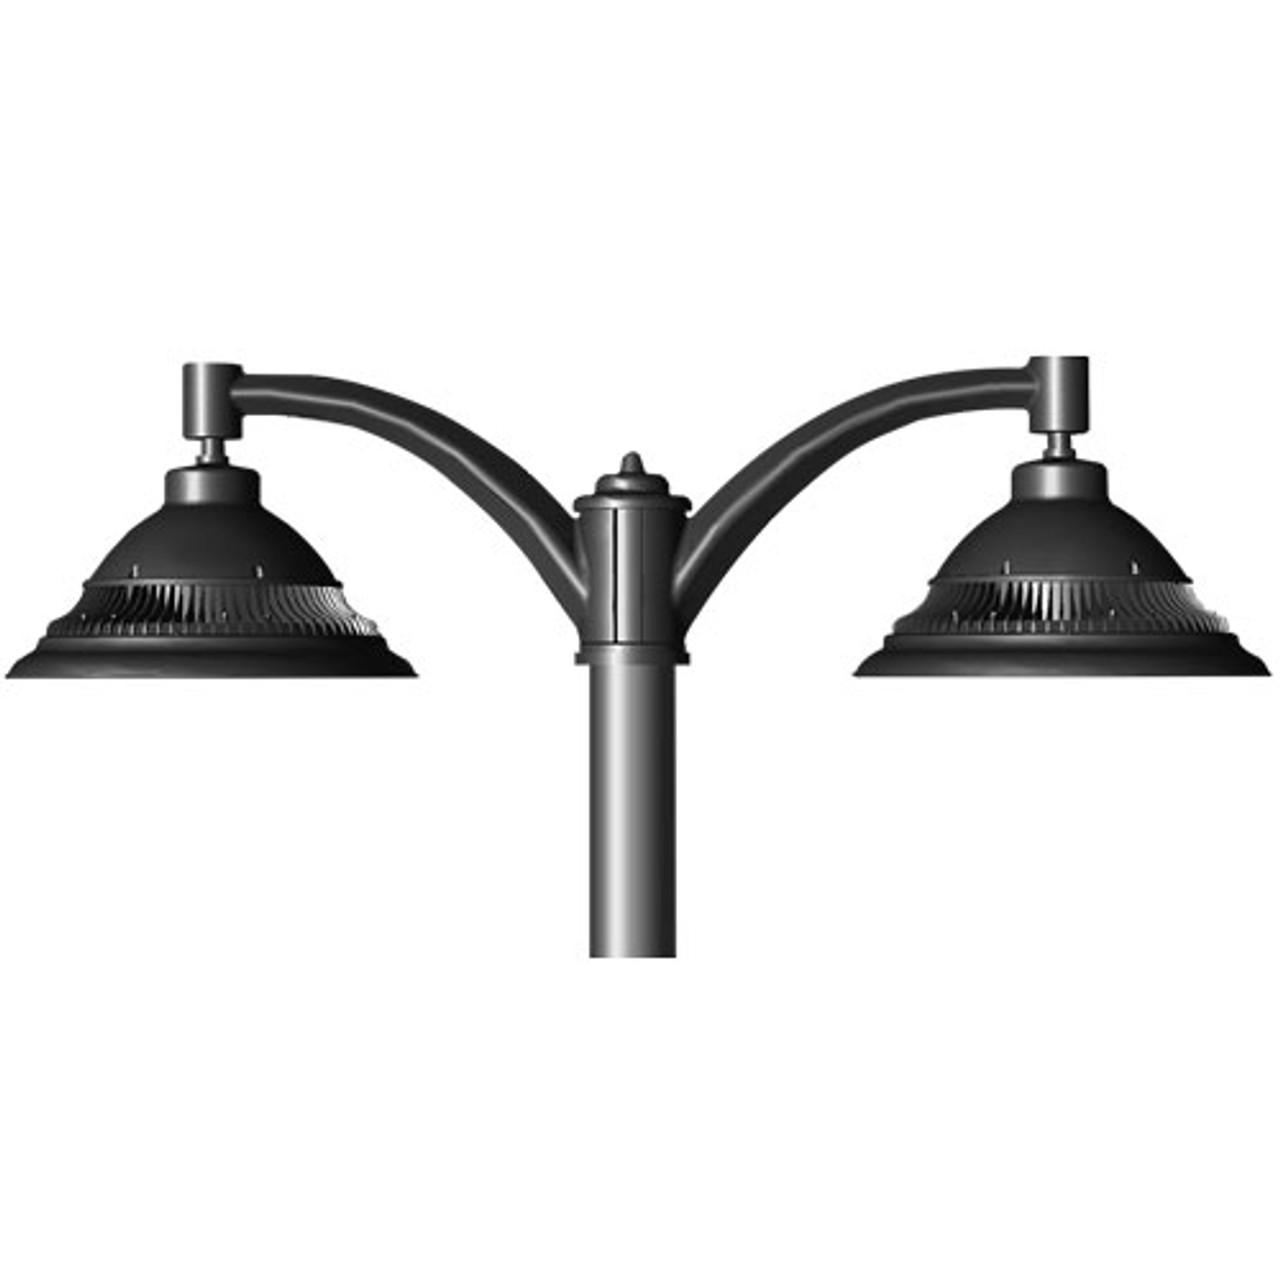 Bell 2 x 37 Watt Pendant LED Decorative Pole Mounted